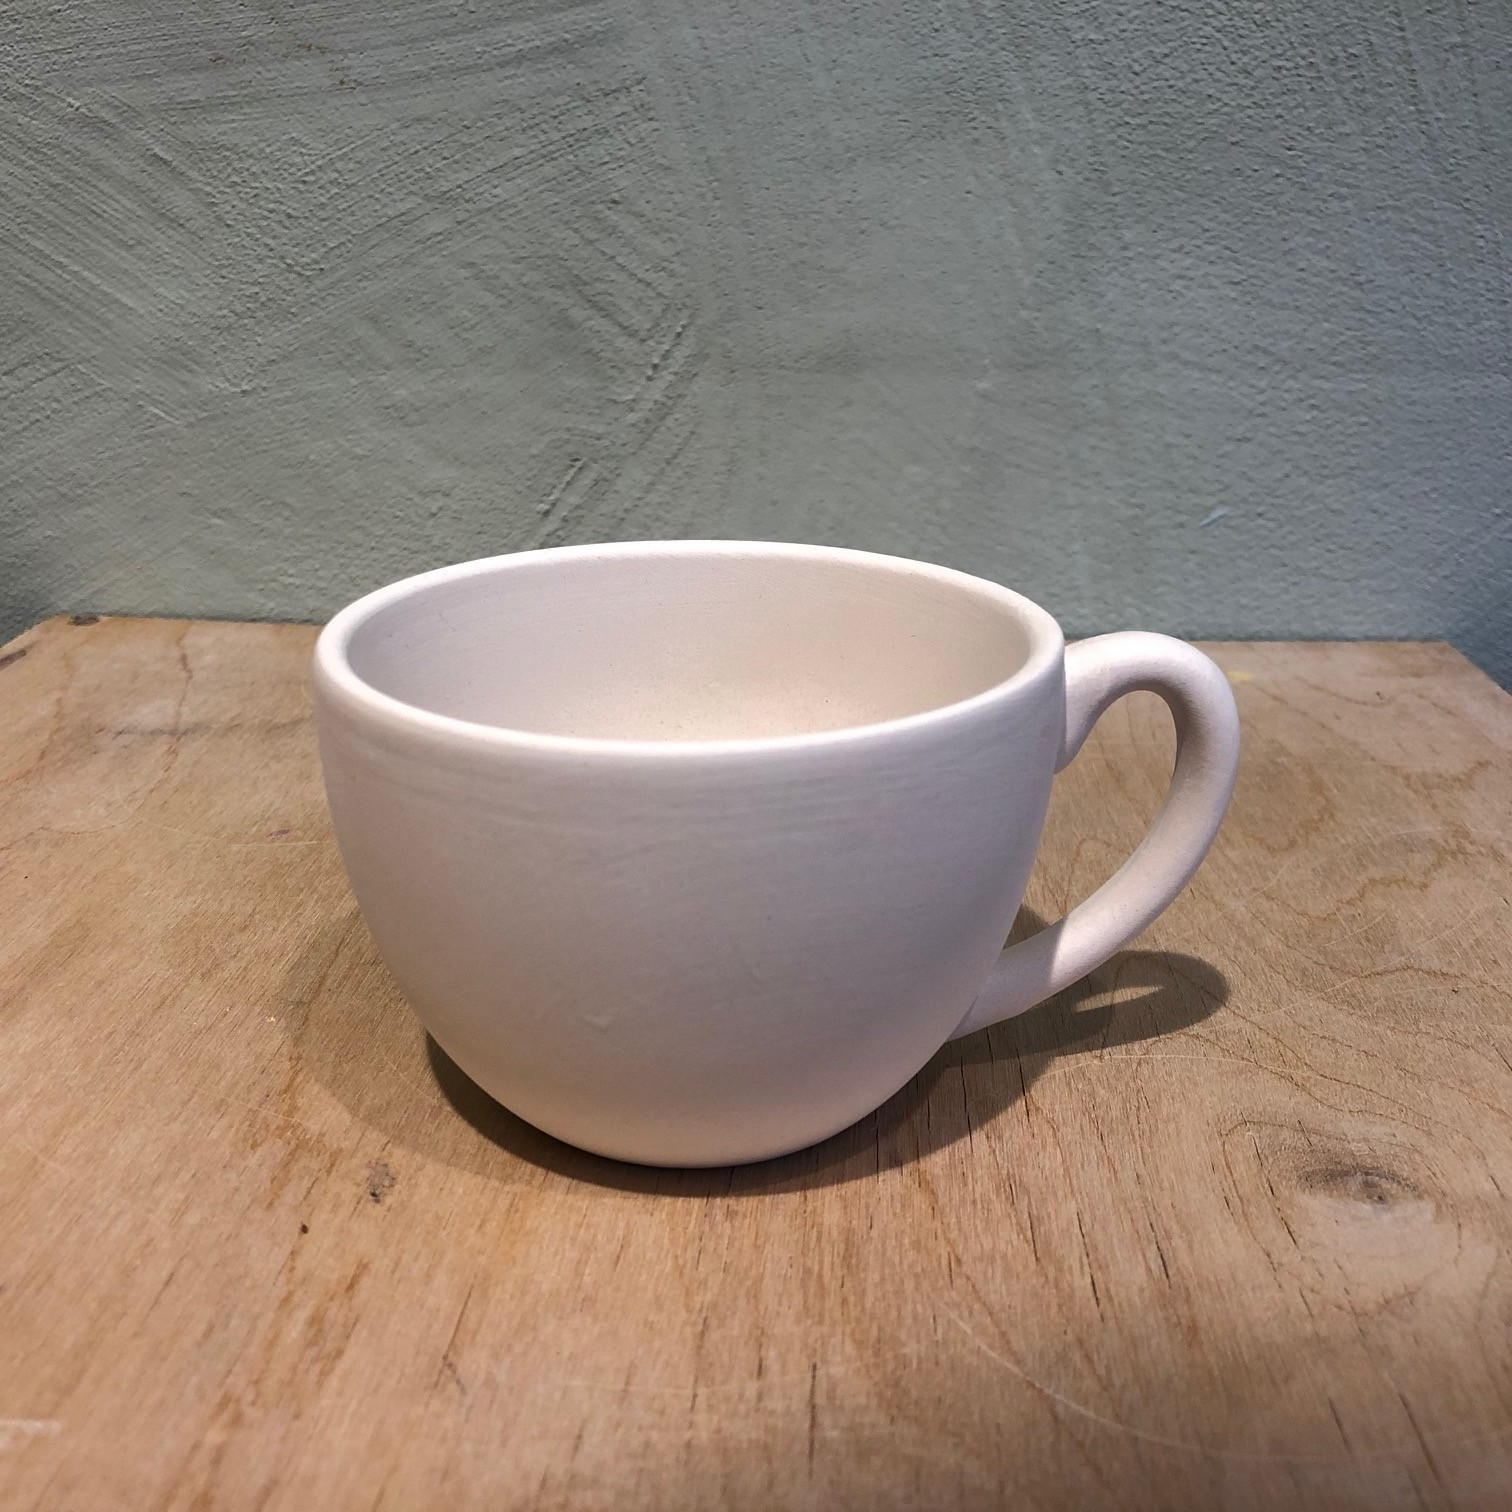 Lille kaffekop, 9 cm